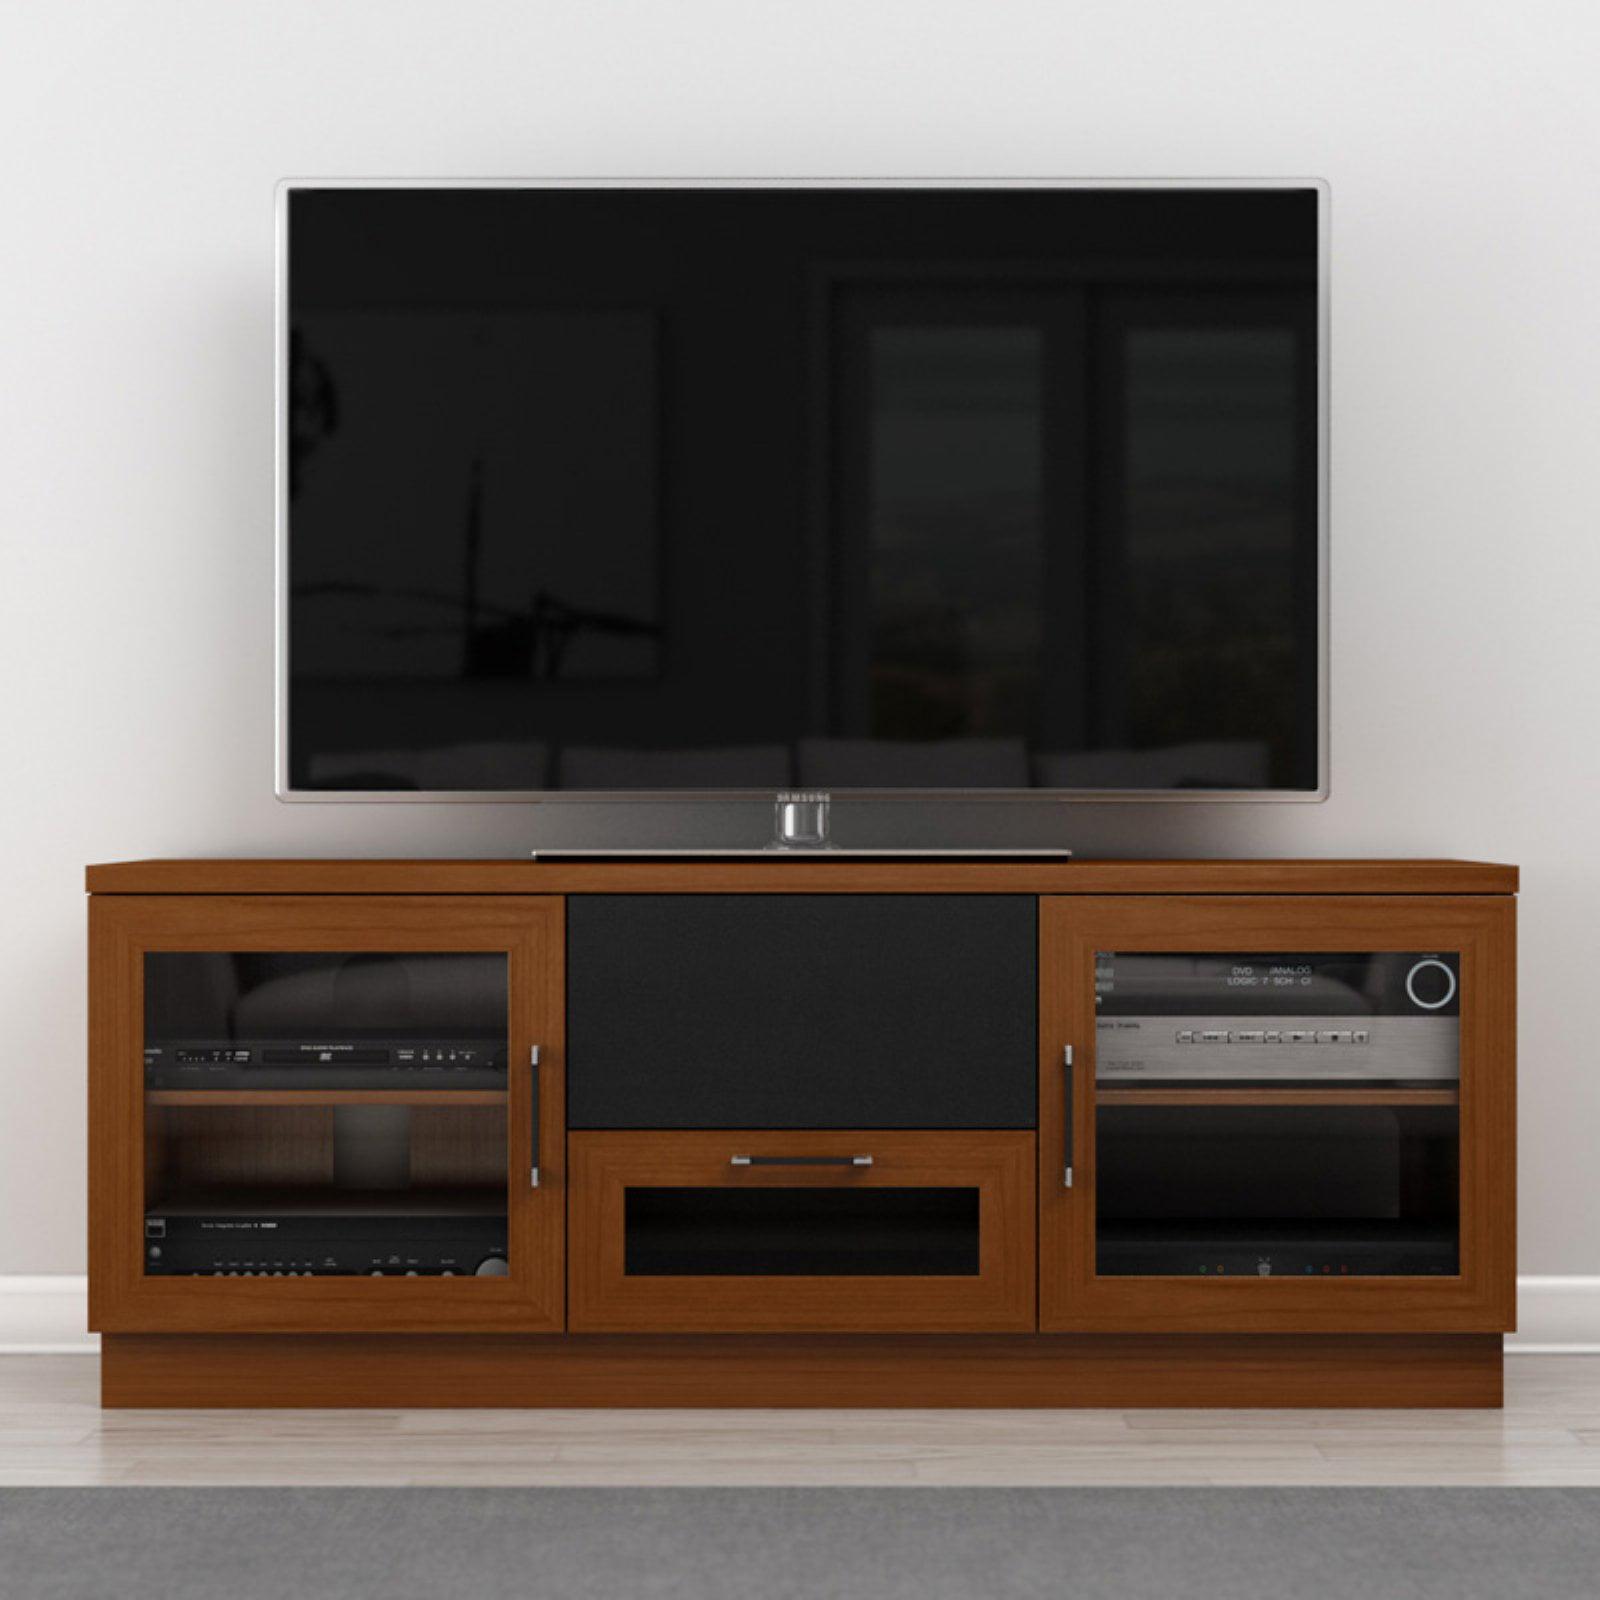 Furnitech Contemporary 60 Inch TV Stand